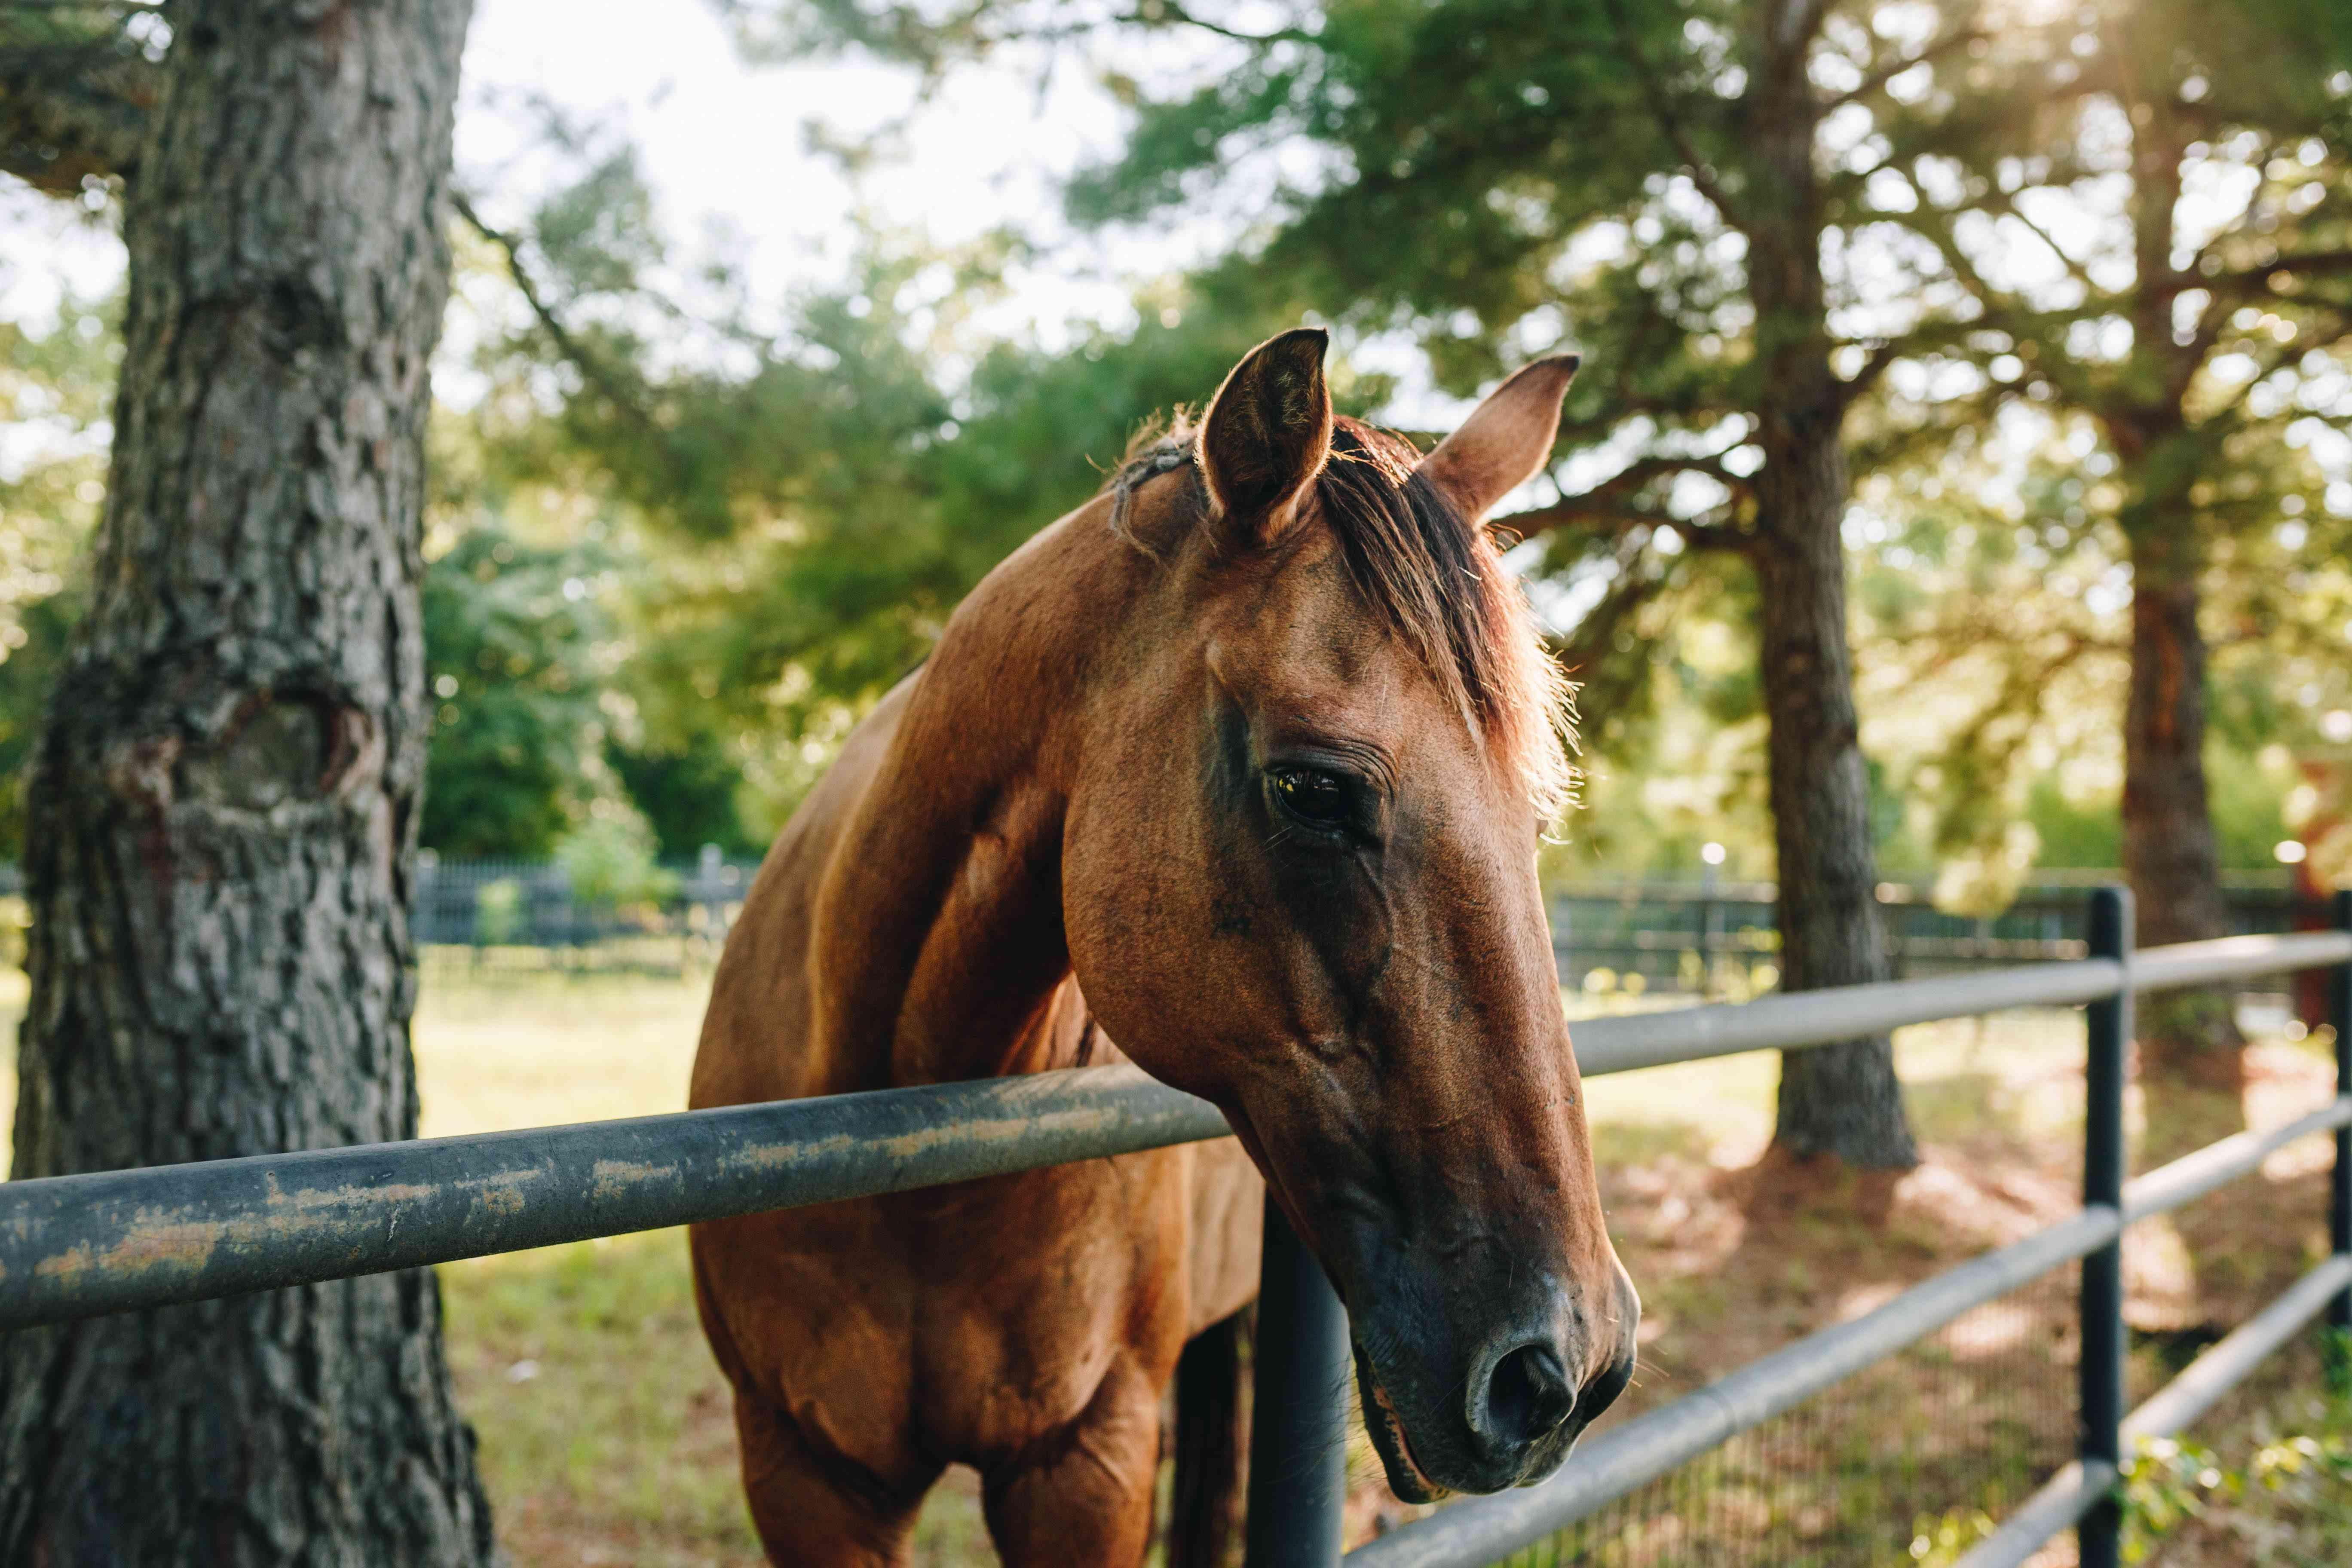 brown horse hangs head over metal fence